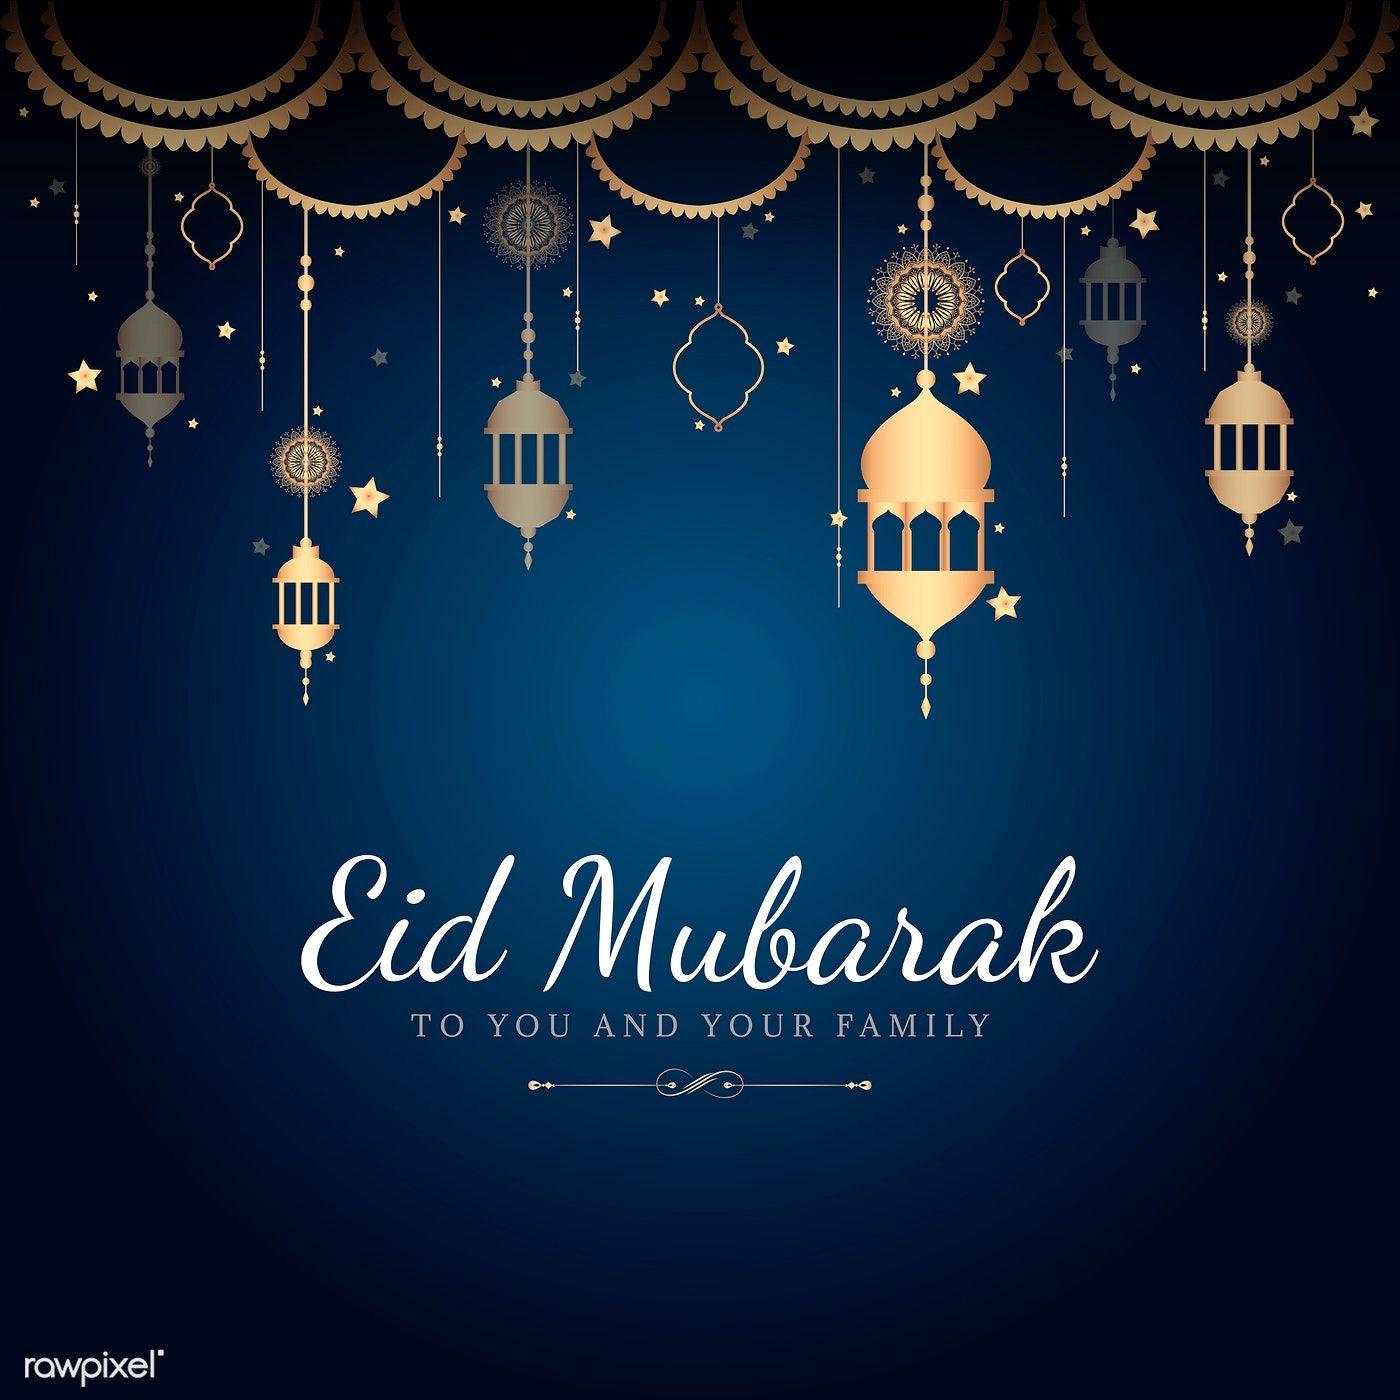 Download Premium Vector Of Eid Mubarak Card With Lanterns Pattern